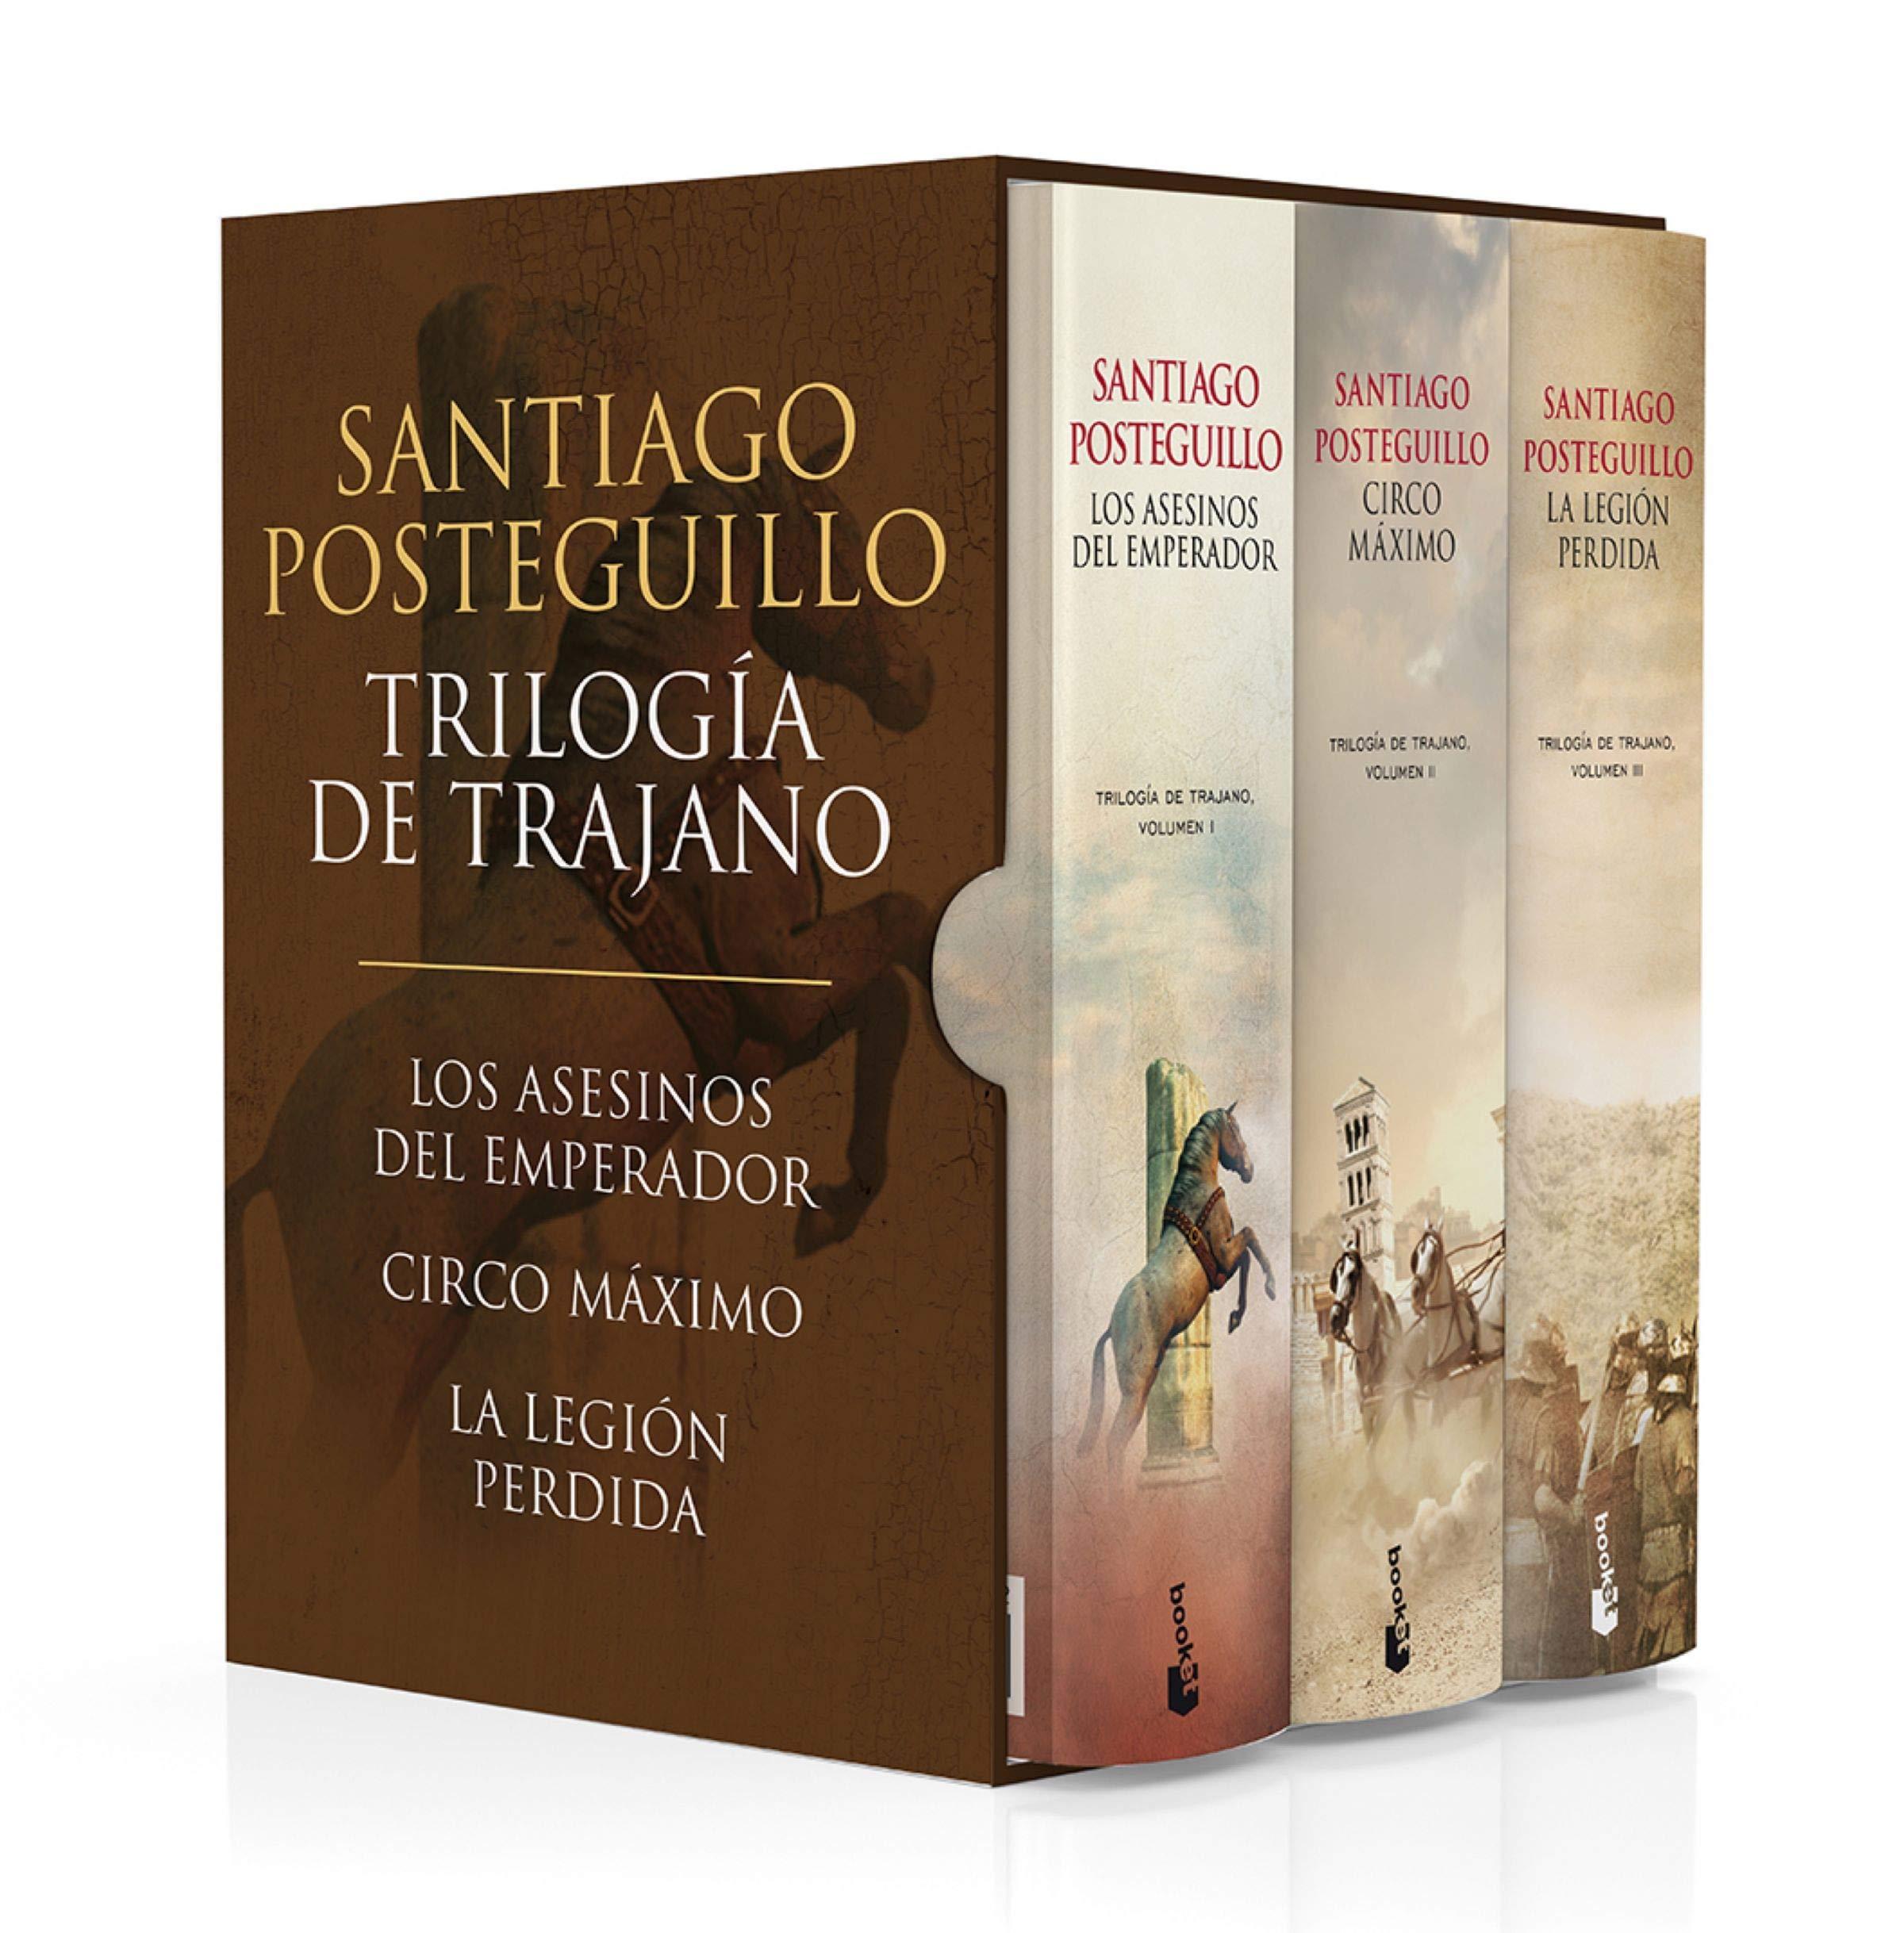 Estuche Trilogía de Trajano (Novela histórica): Amazon.es: Posteguillo, Santiago: Libros